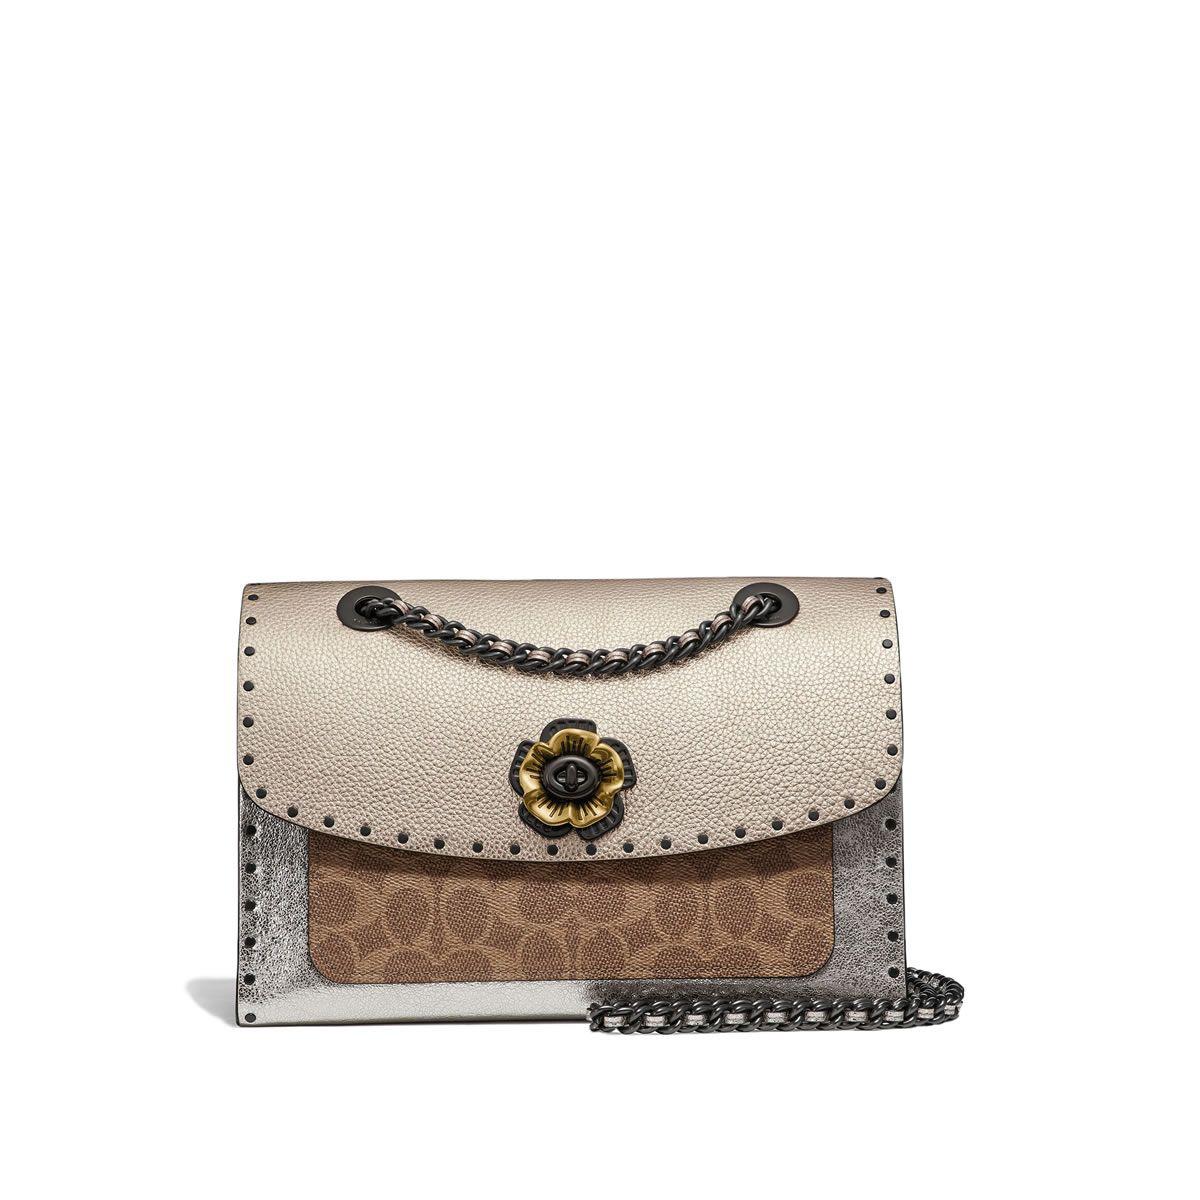 c12906b7b8 Handbag COACH - Macy s